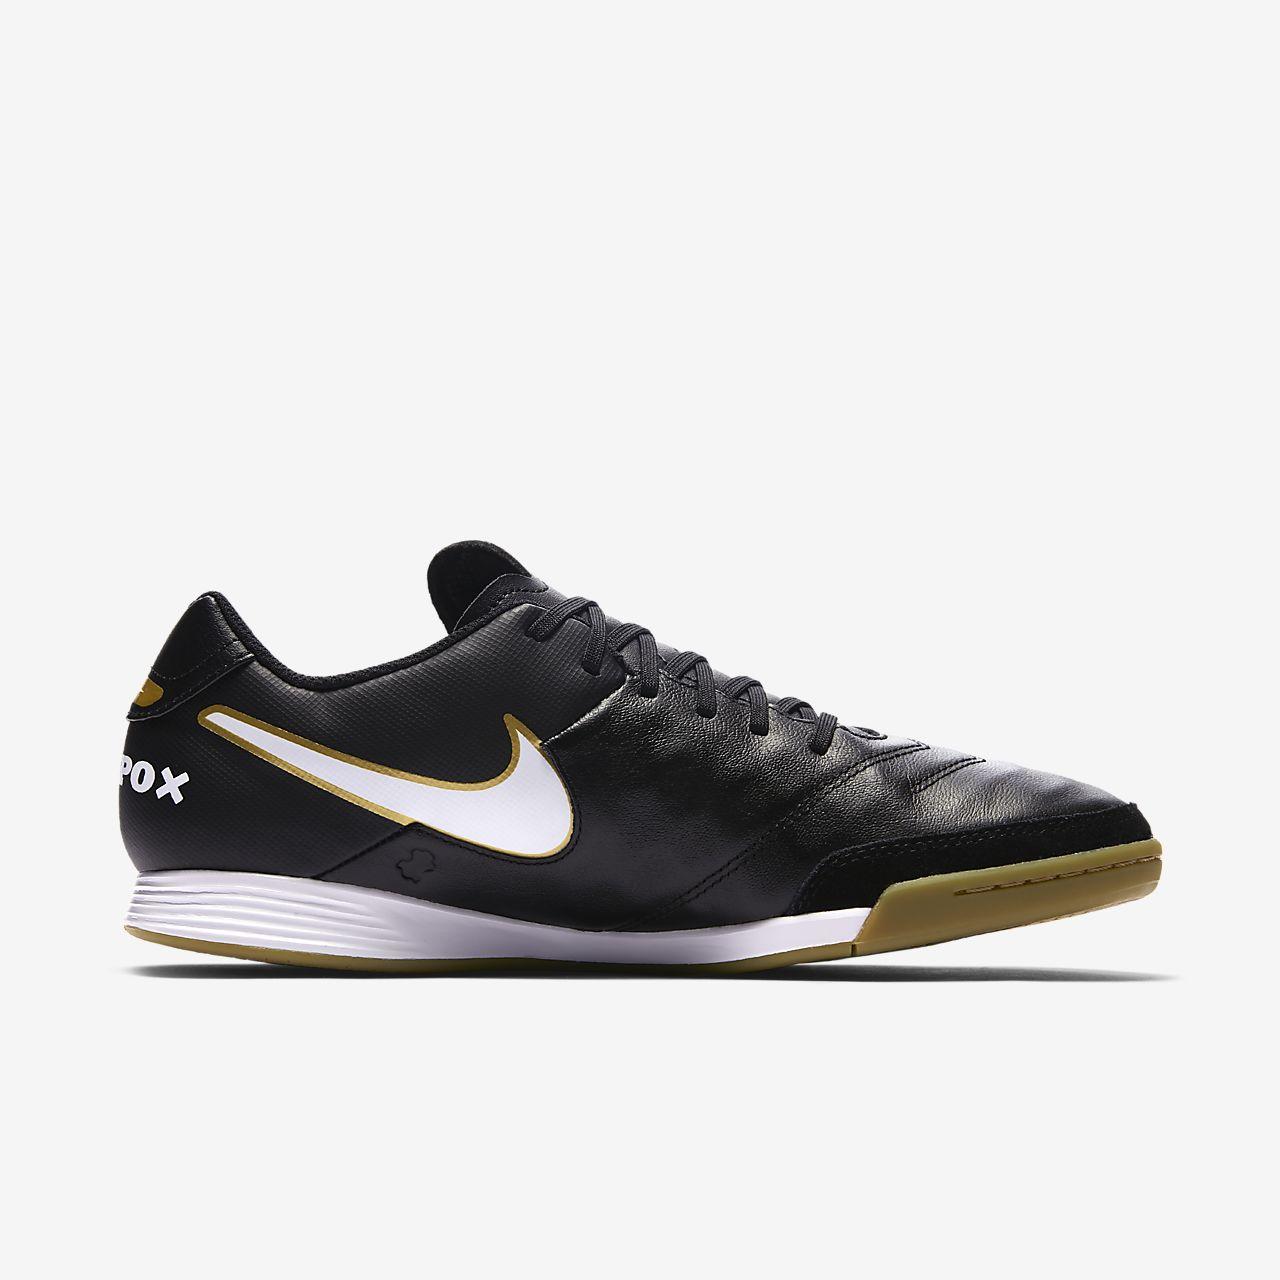 Nike Tiempo Genio II Leather IndoorCourt Football Shoe